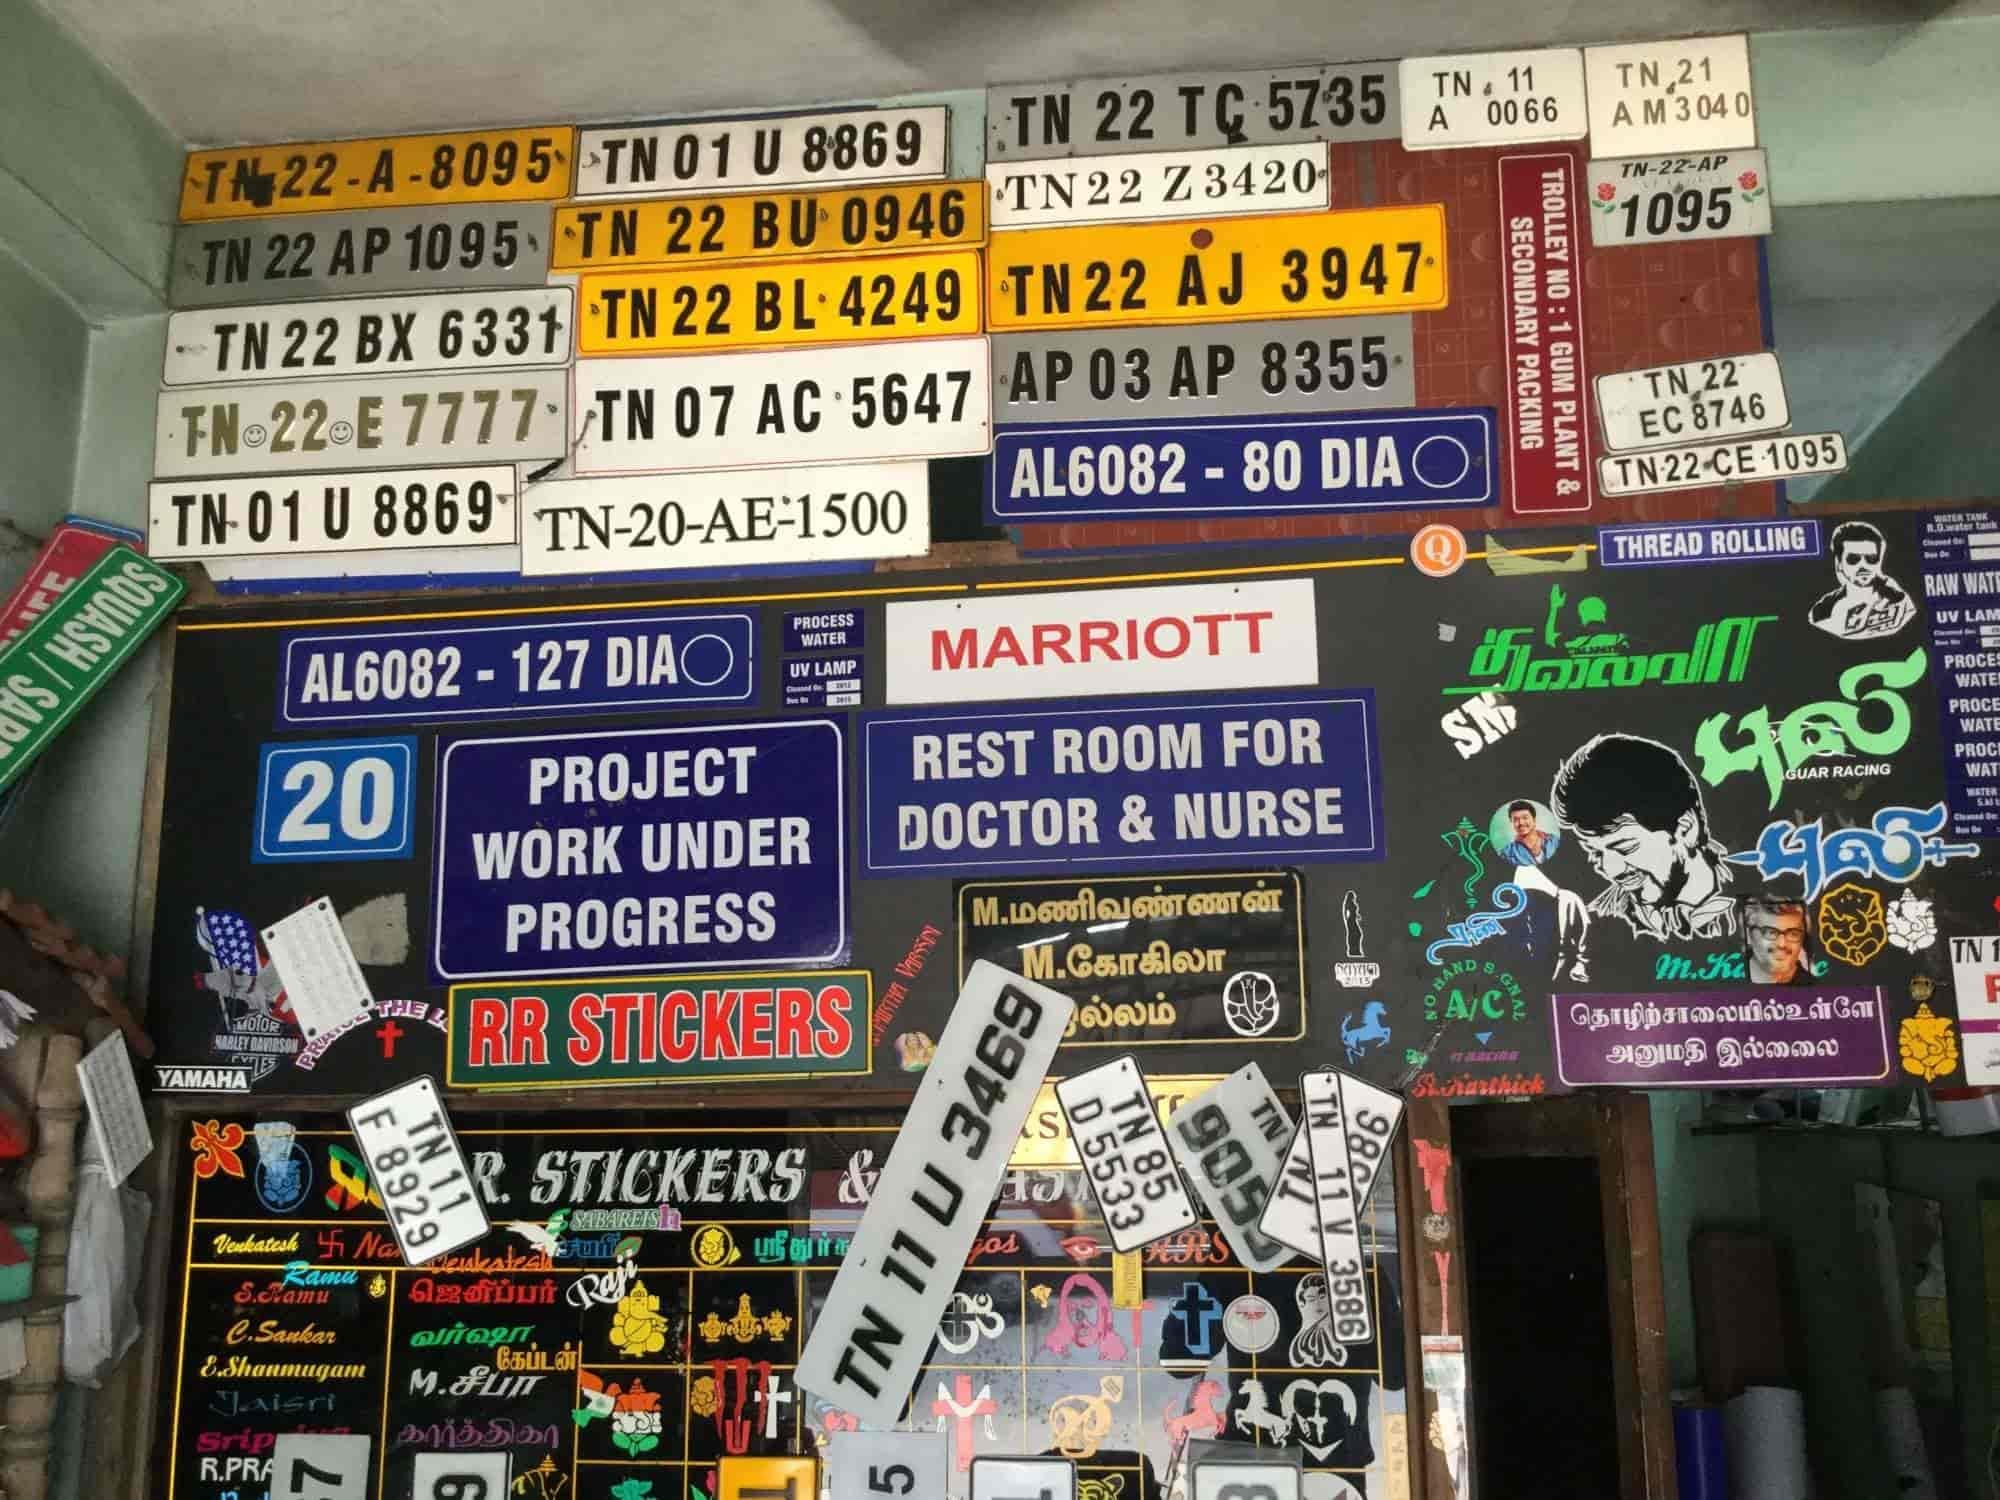 Rr stickers tambaram sanatorium car accessory dealers in chennai